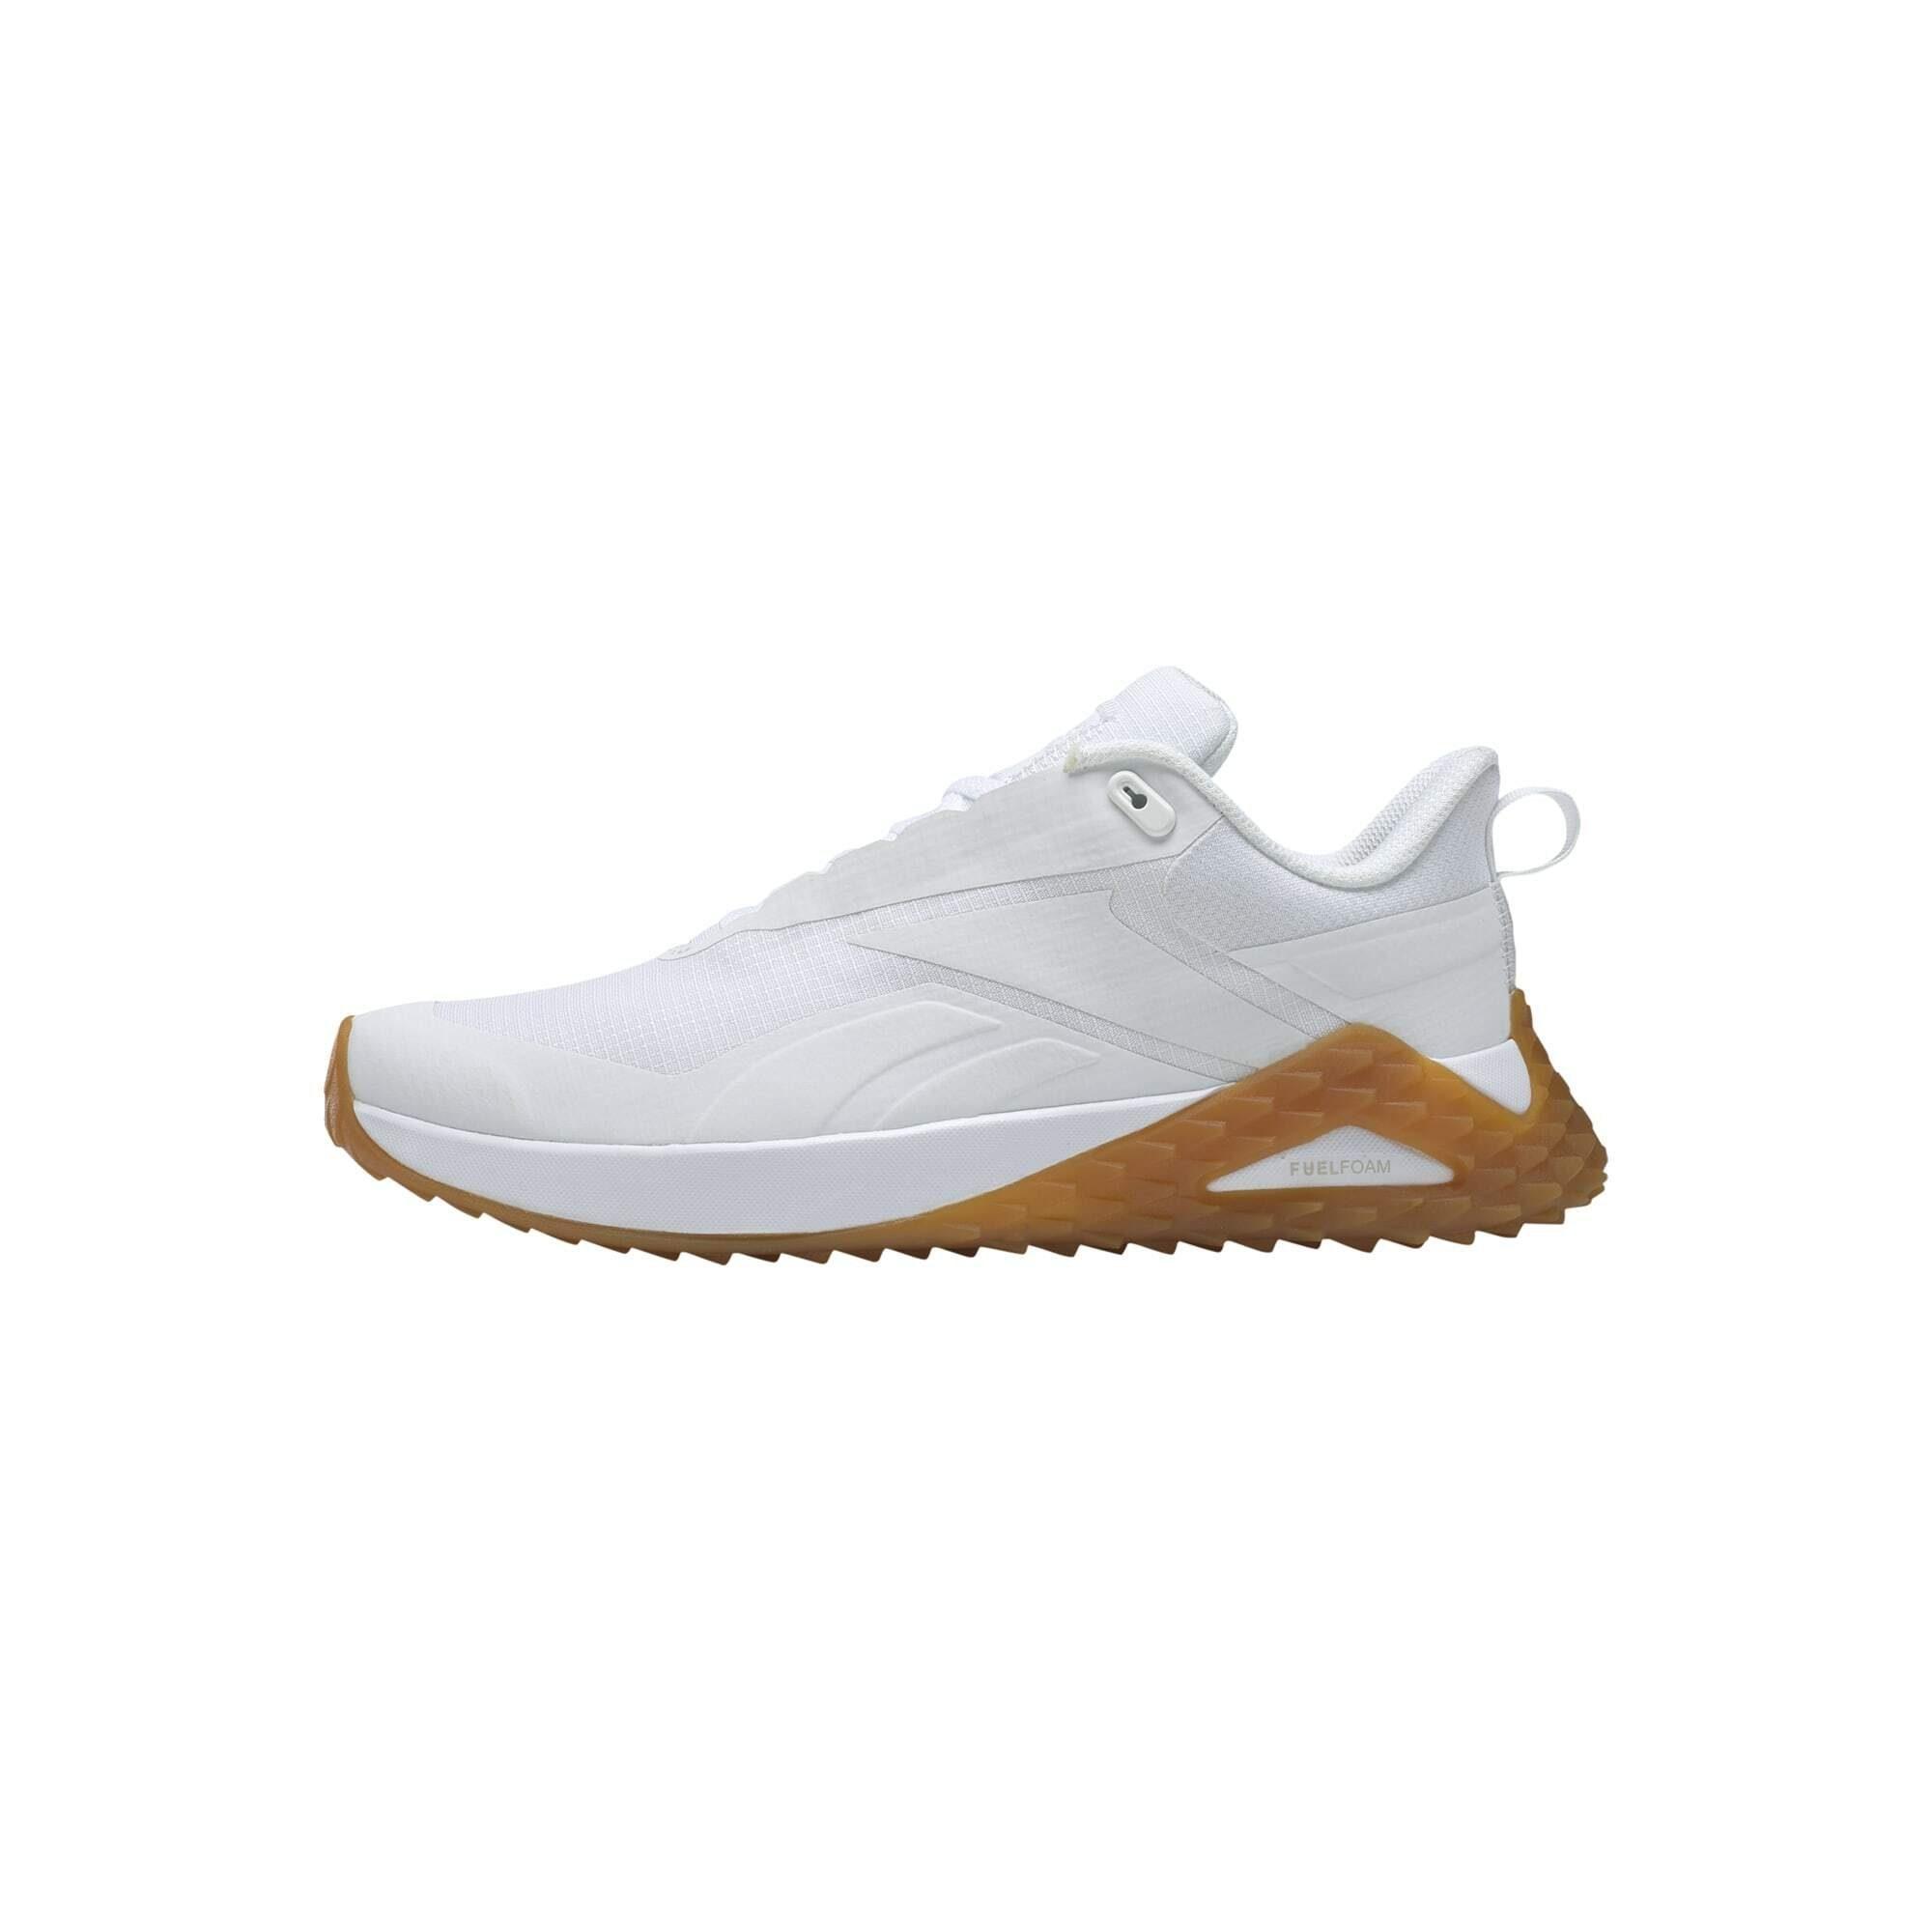 Reebok »Trail Cruiser Shoes« Trainingsschuh kaufen | OTTO